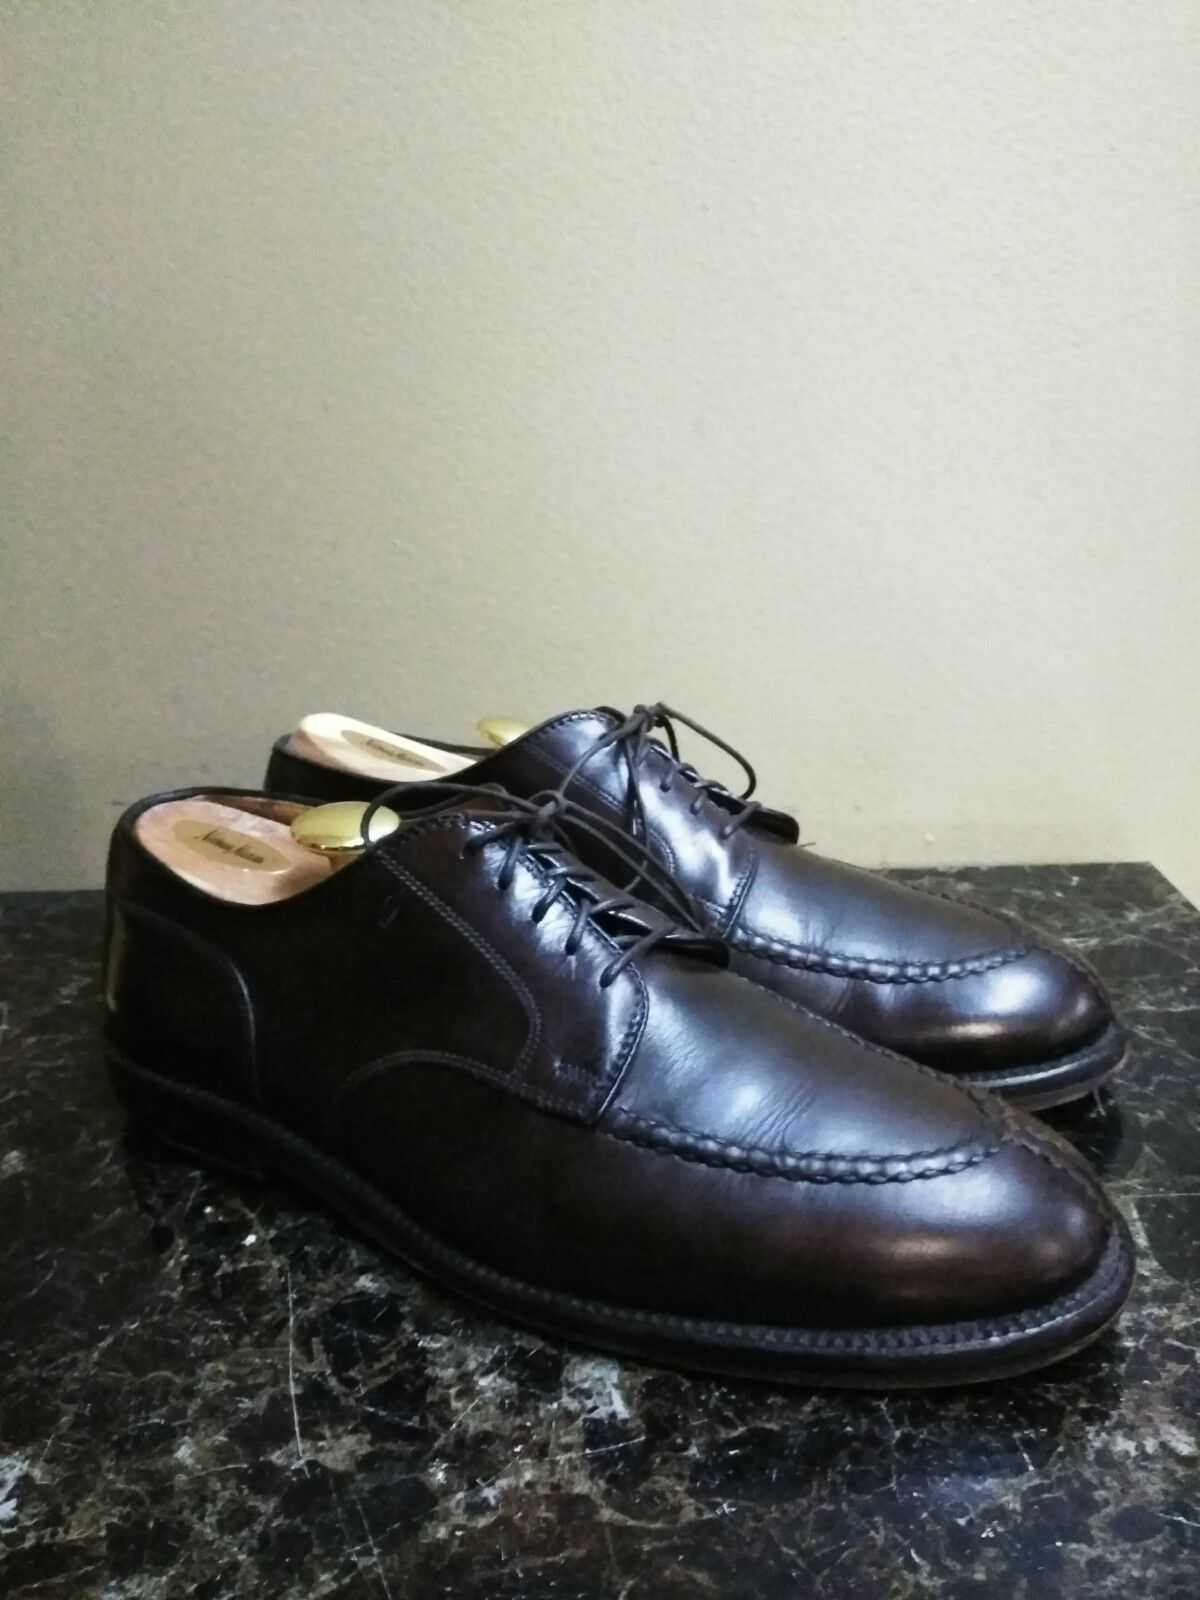 Alden 925 Norwegian Split Toe Handsewn Dark Marronee Blucher Derby scarpe Sz 8.5 B D